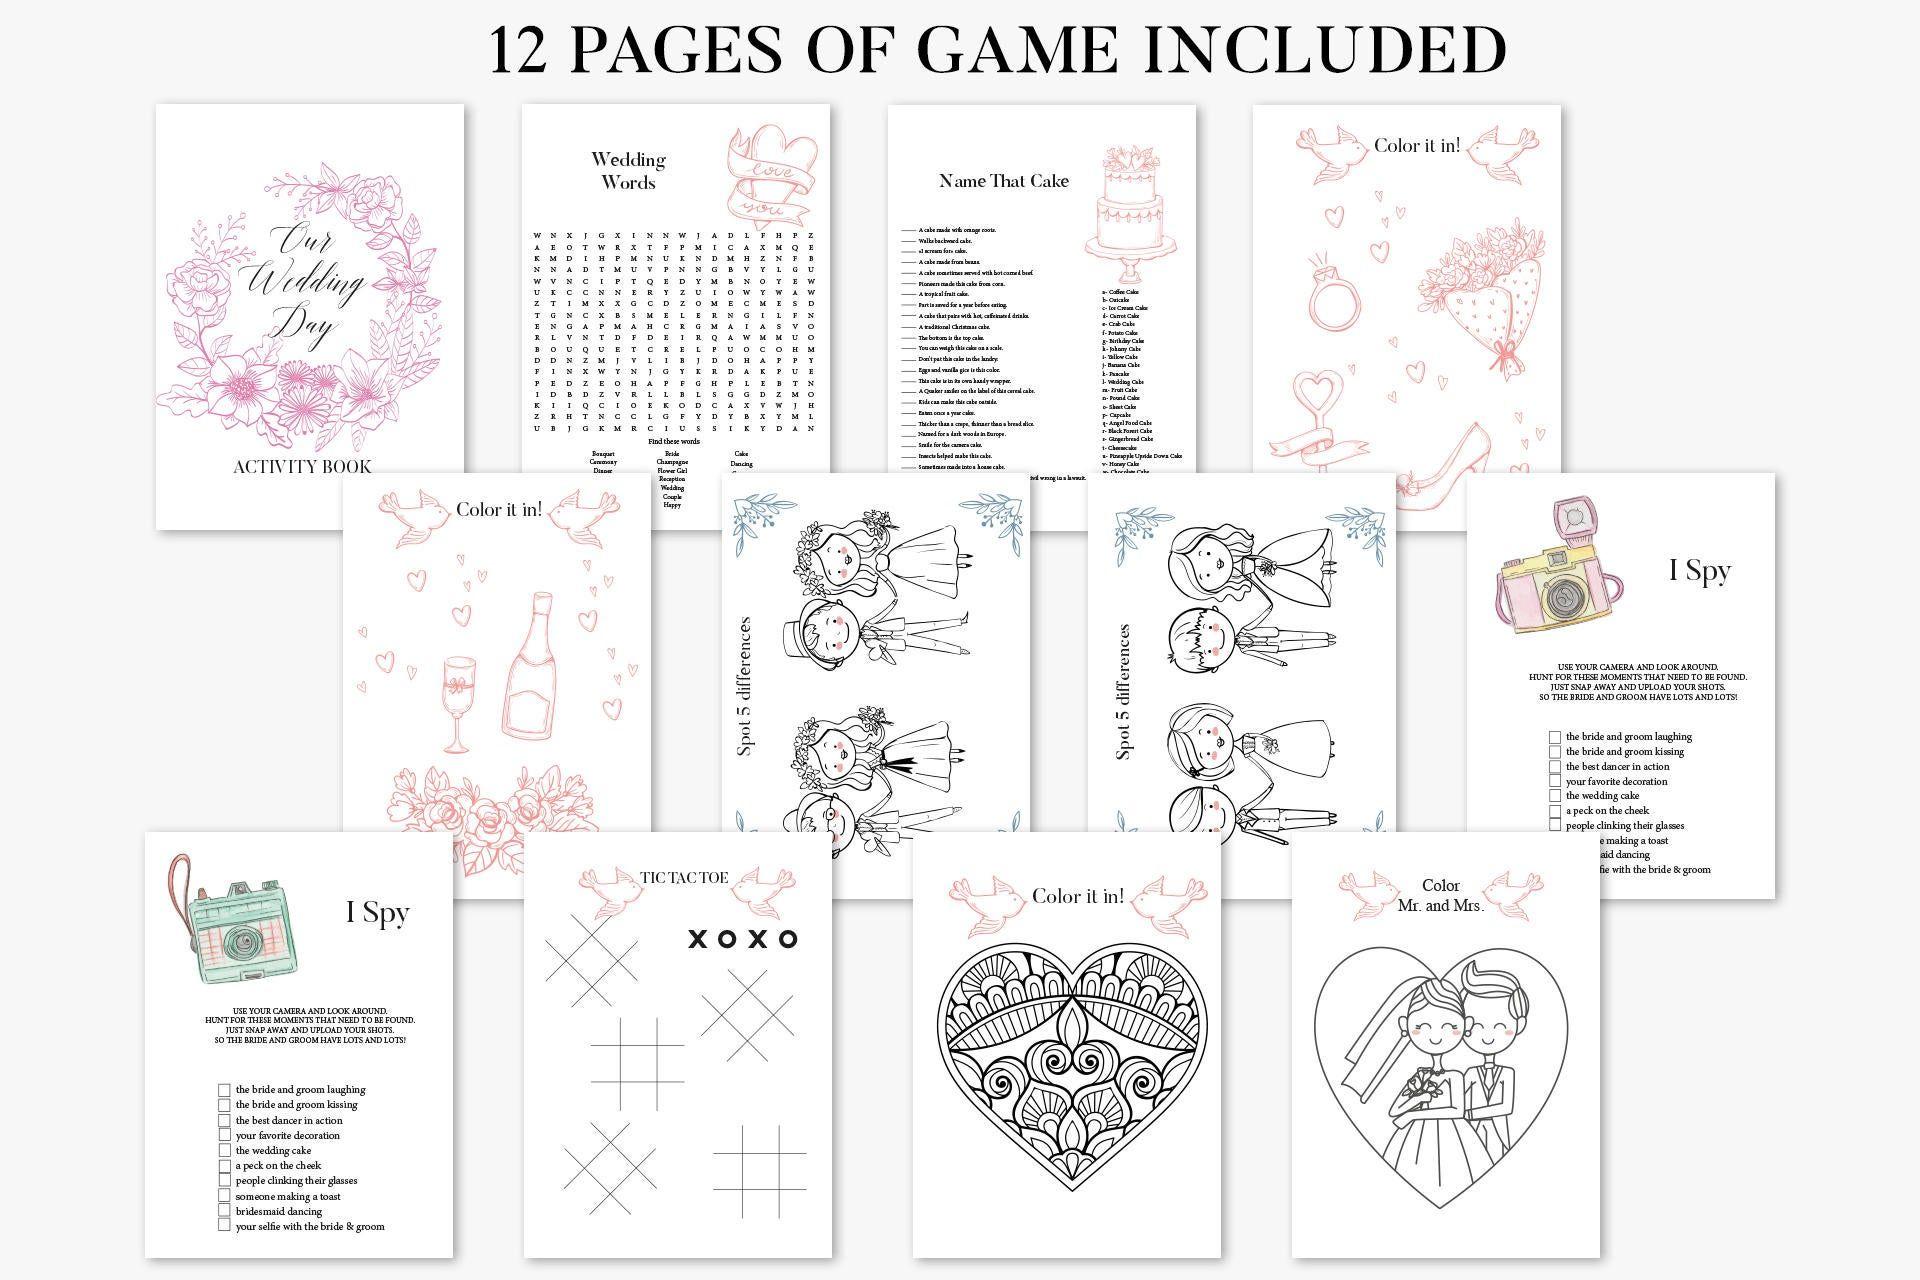 Wedding Activity Book Printable Wedding Coloring Book Kids Etsy In 2021 Wedding Games For Kids Kids Wedding Activities Wedding With Kids